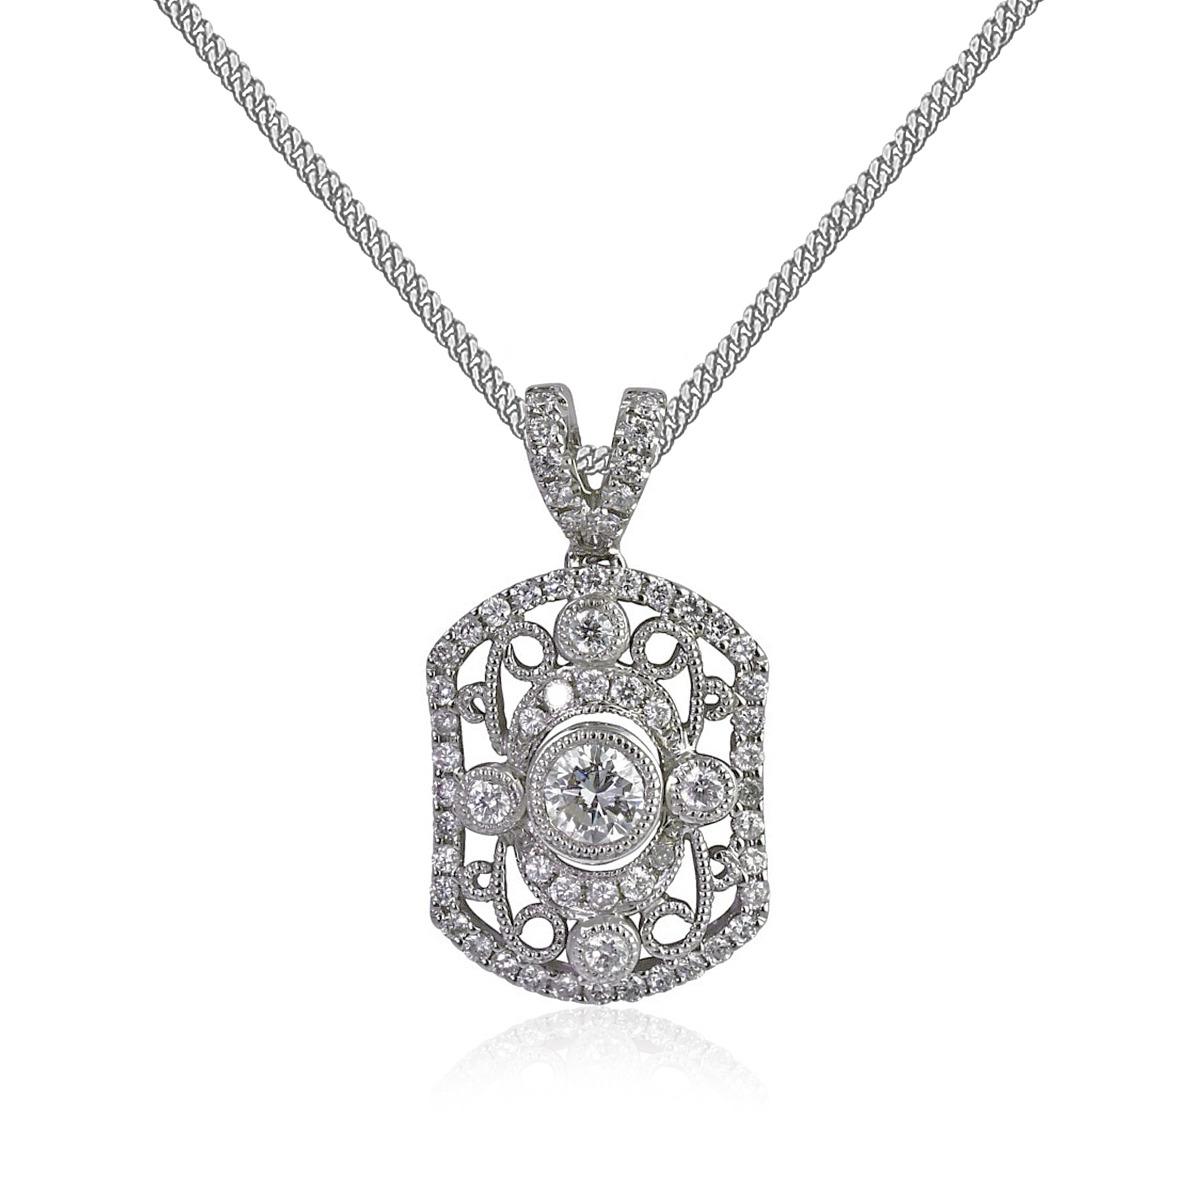 18ct White Gold Rectangular Diamond Pendant